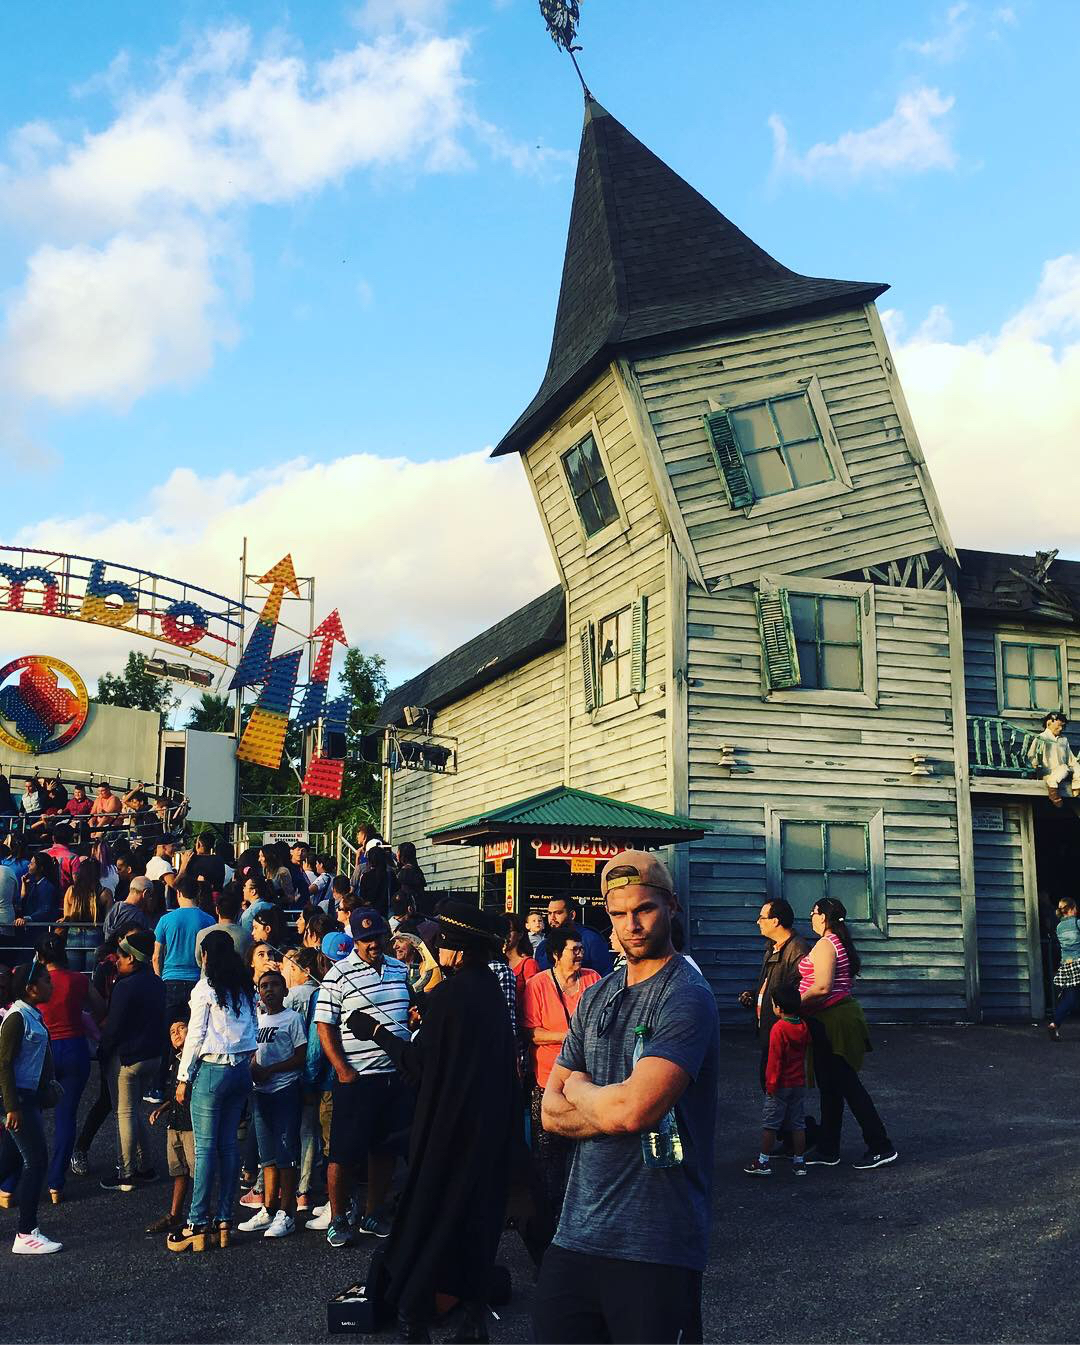 Parque Rodo - amusement/theme park in Montevideo